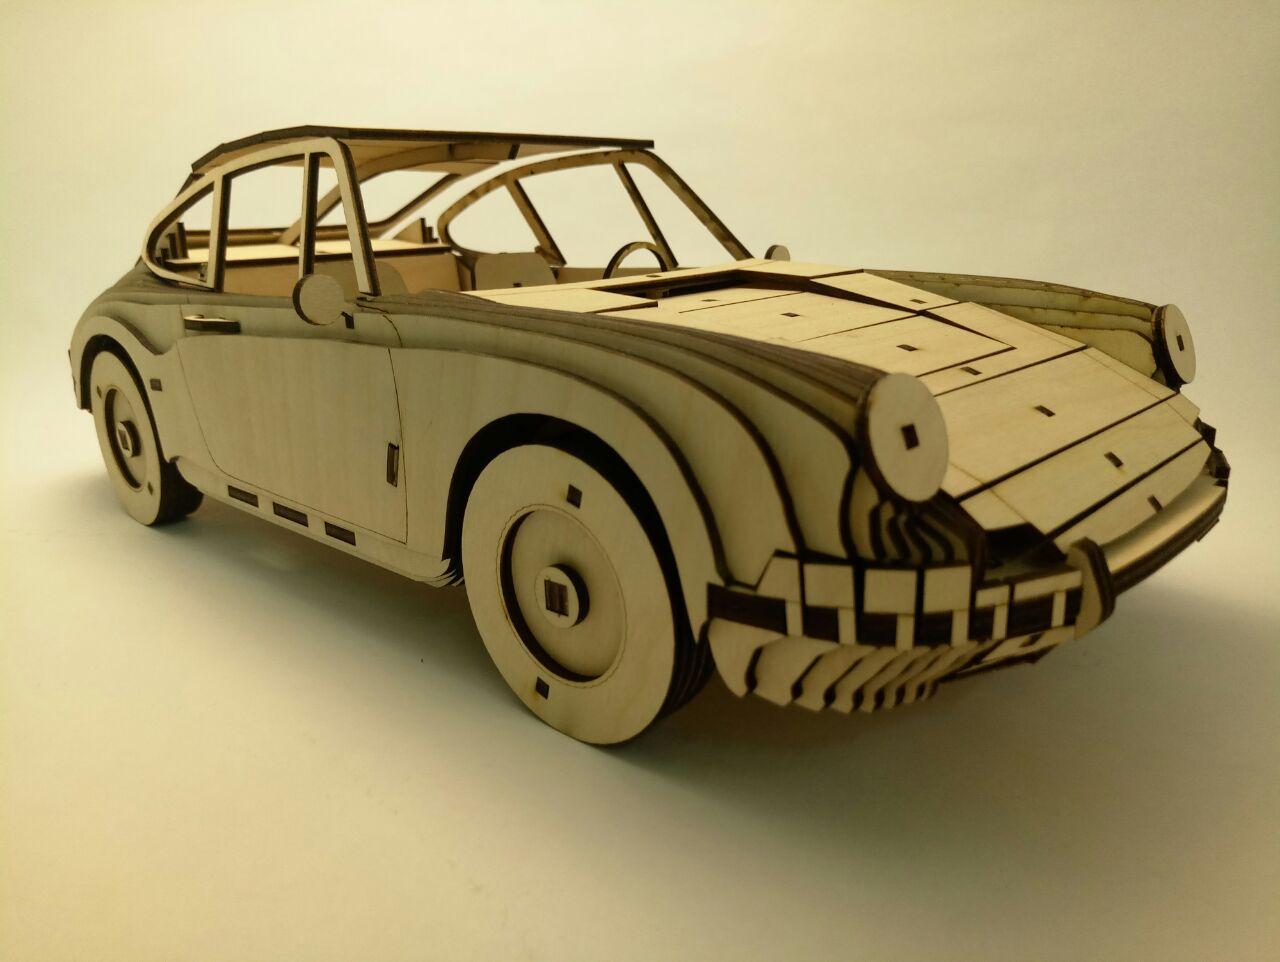 Laser Cut Porsche 911 1964 Wooden Model Free CDR Vectors Art